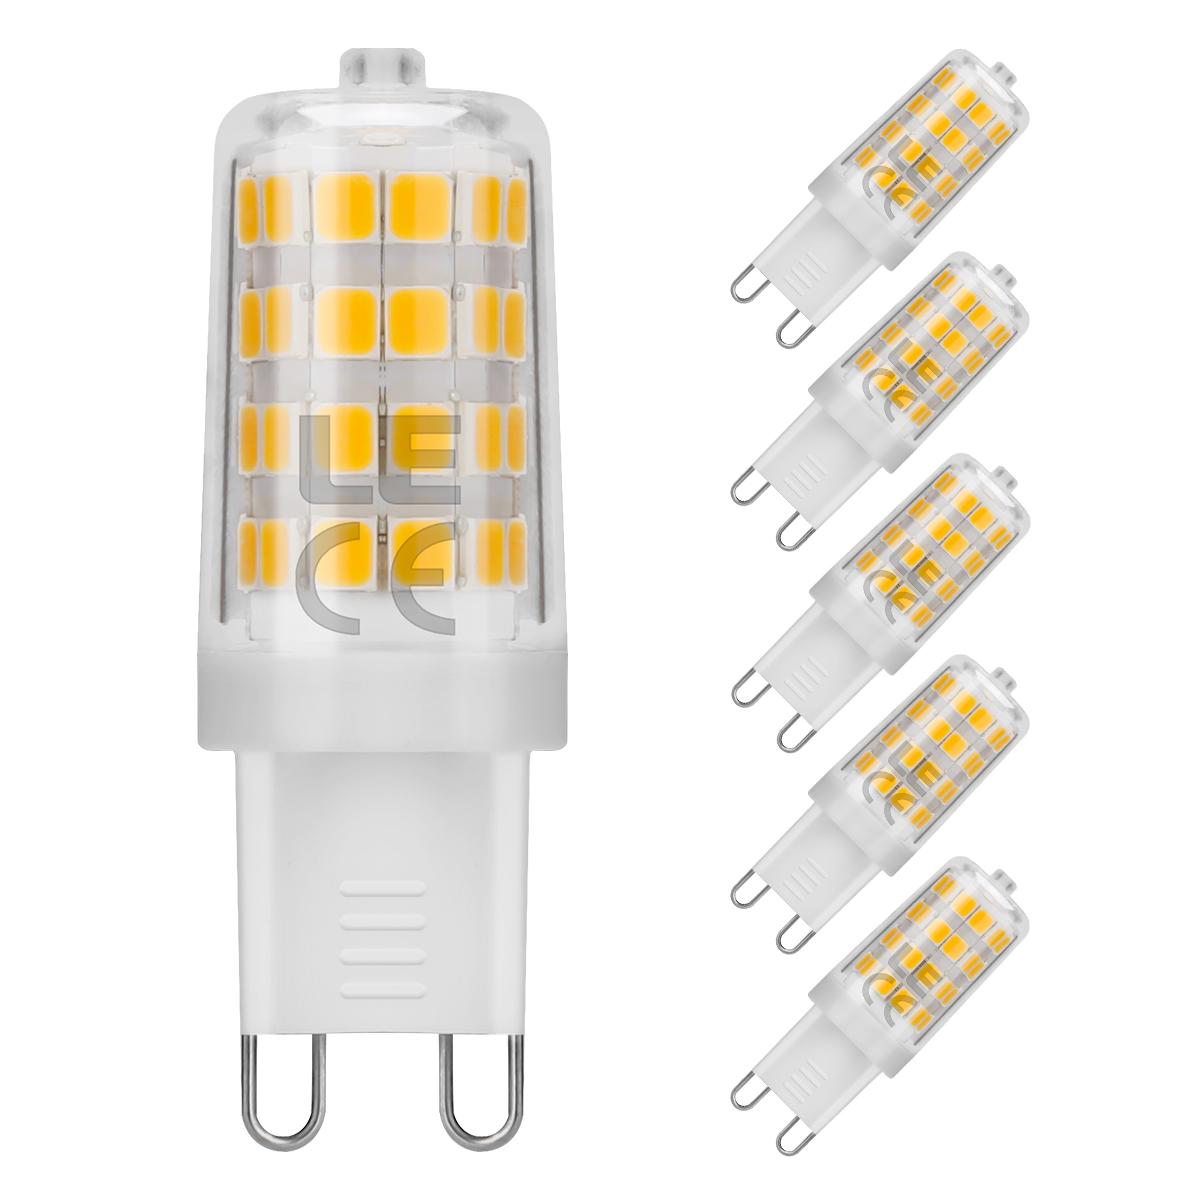 5W G9 LED Lampen, 340lm LED Birnen, 360° Beleuchtung, ersetzt 50W Halogenlampen, LED Leuchtmittel, Warmweiß, 5er Set